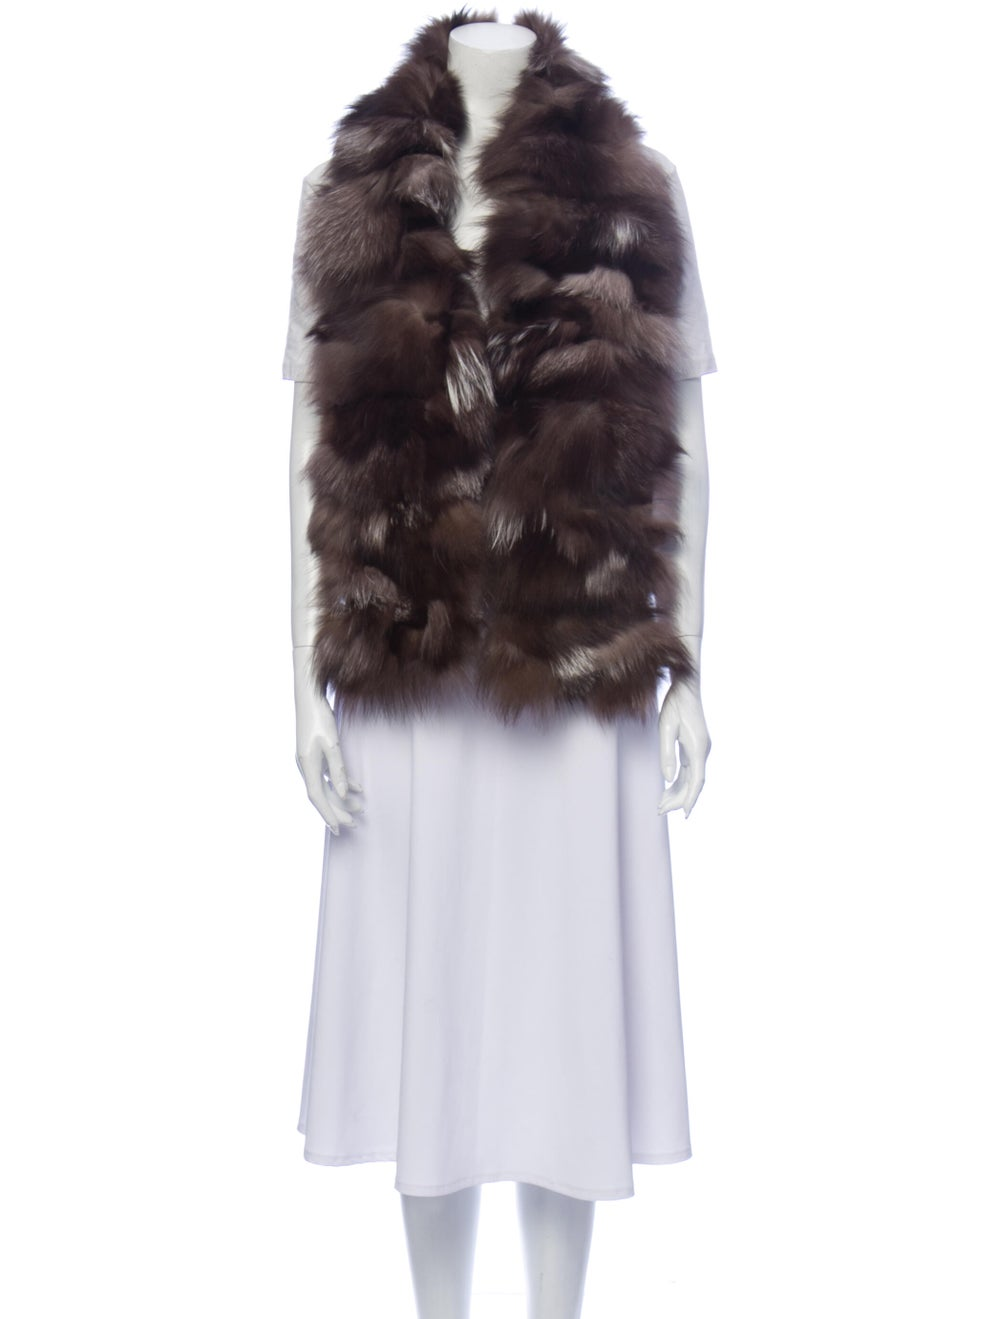 Fox Fur Stole - image 3